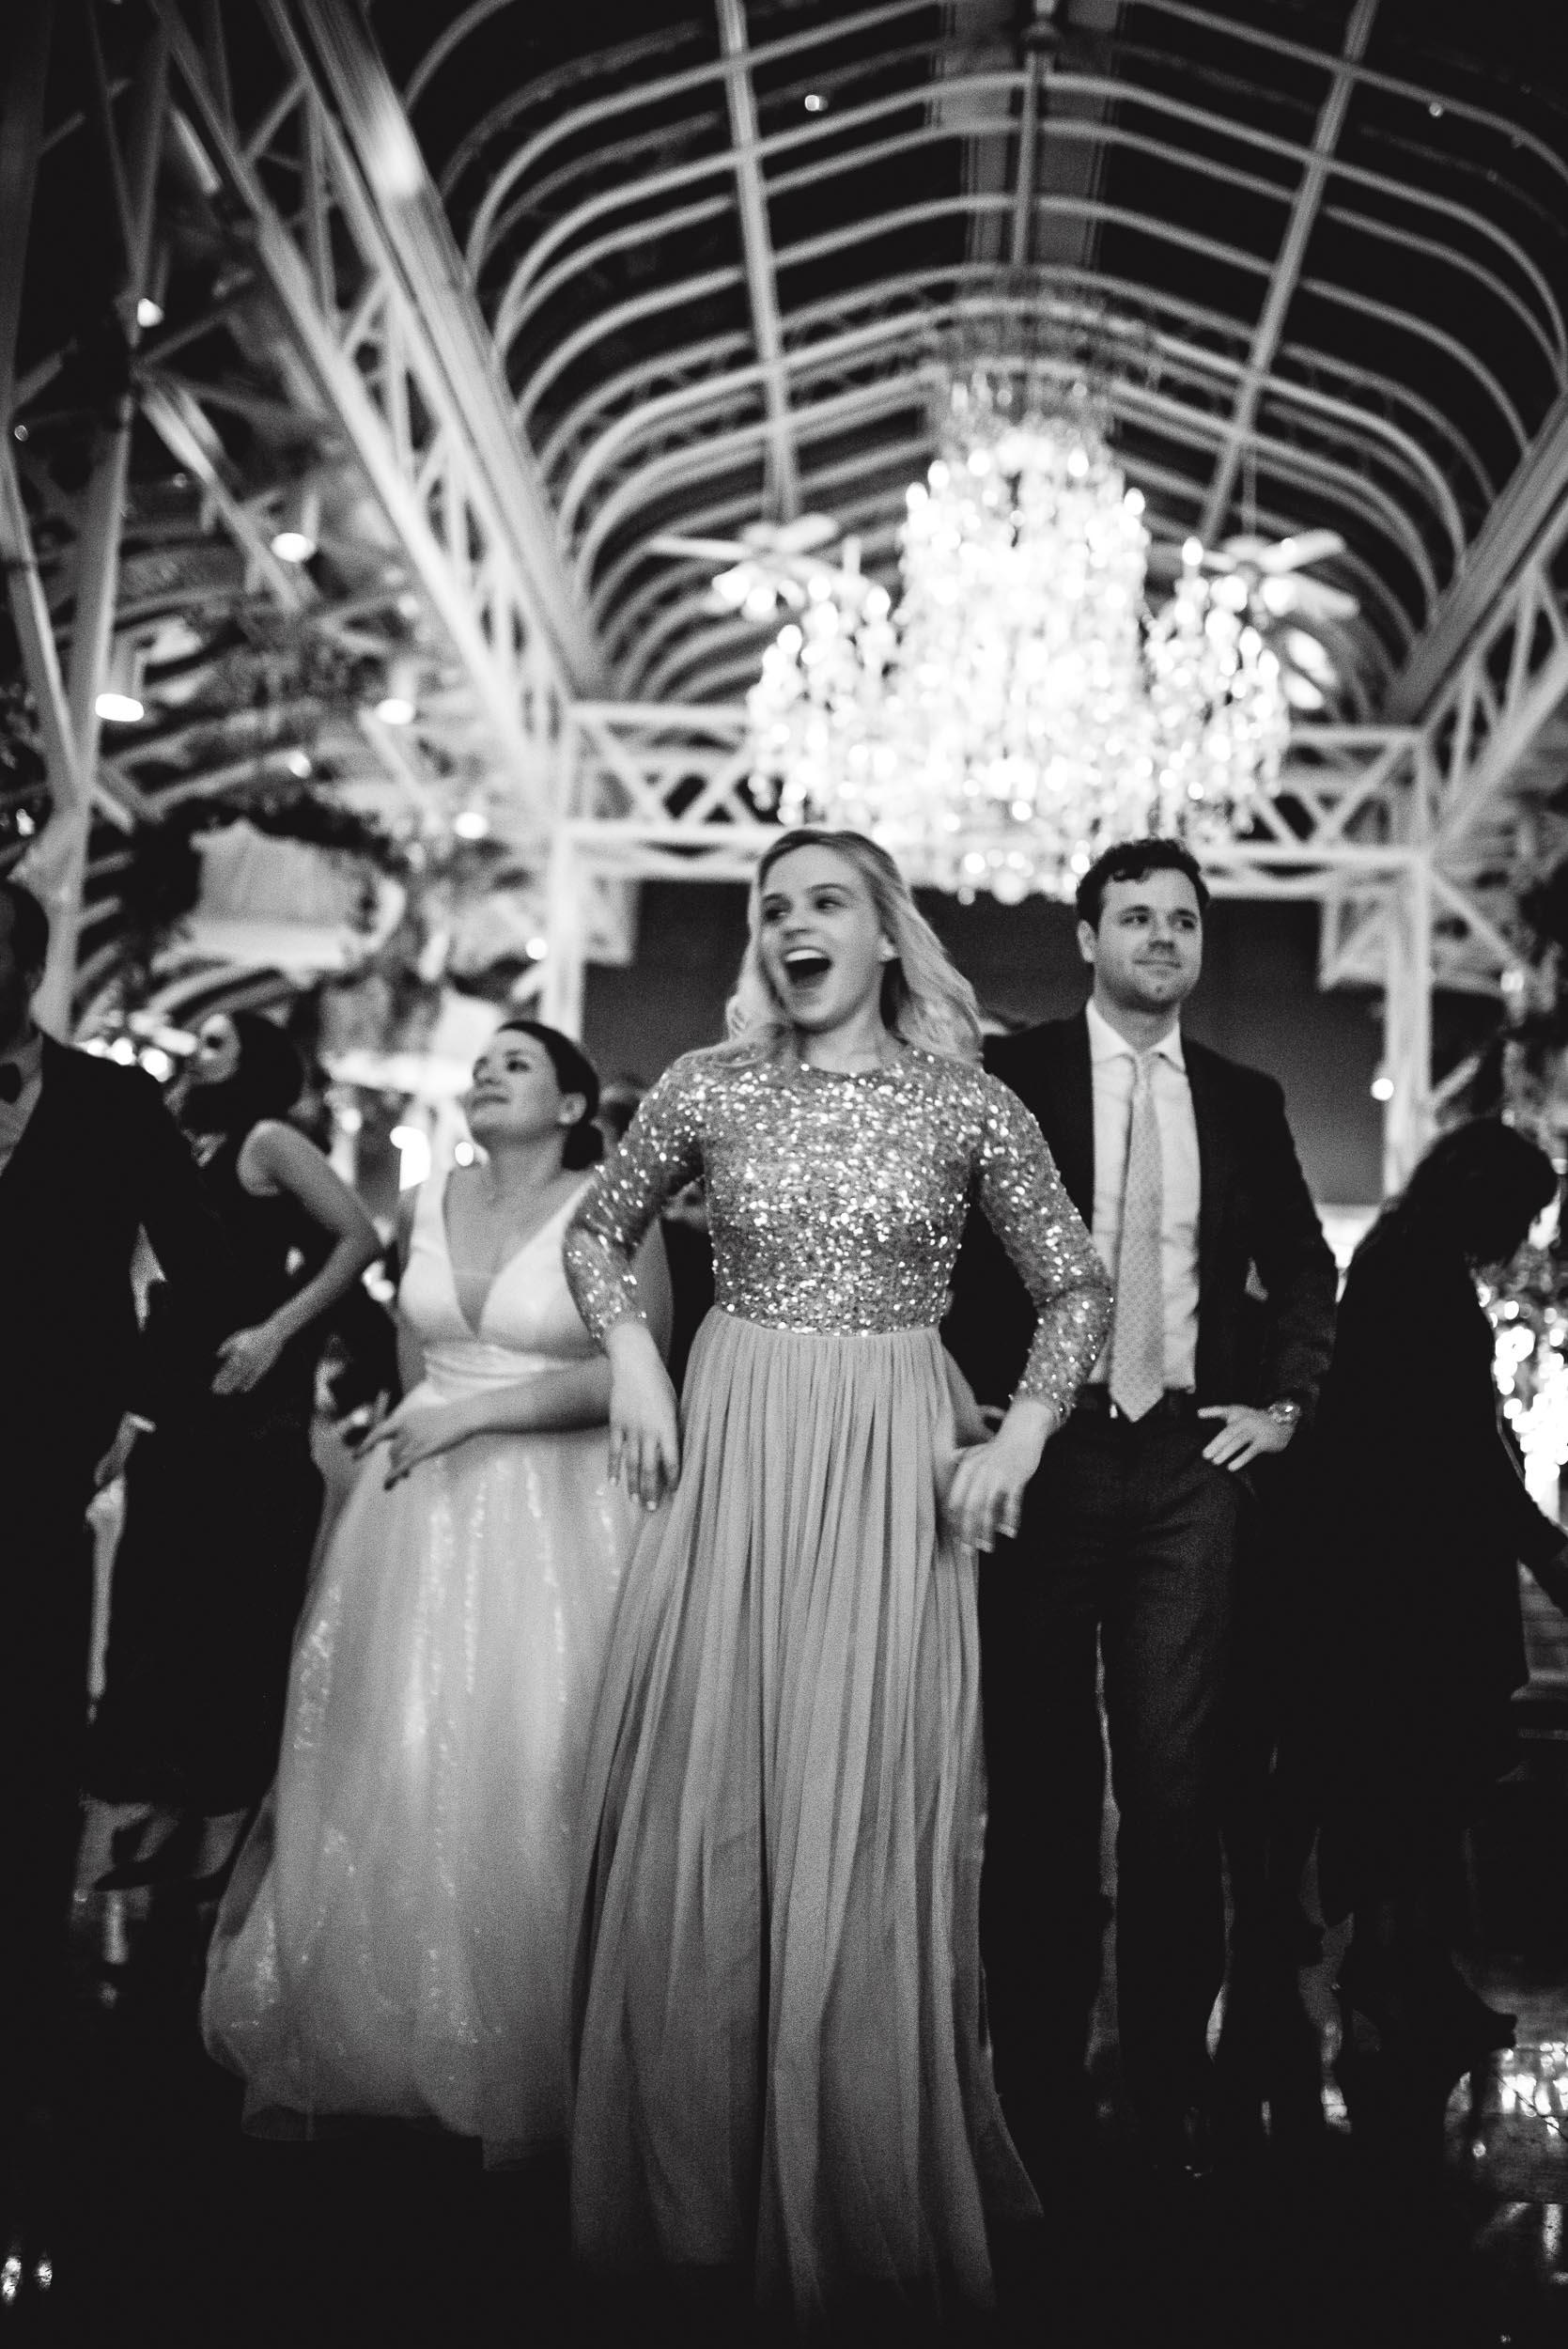 KatieandMathias_Morristown_NewJersey_Wedding_Church_Assumption_Madison_Hotel(56of65).jpg